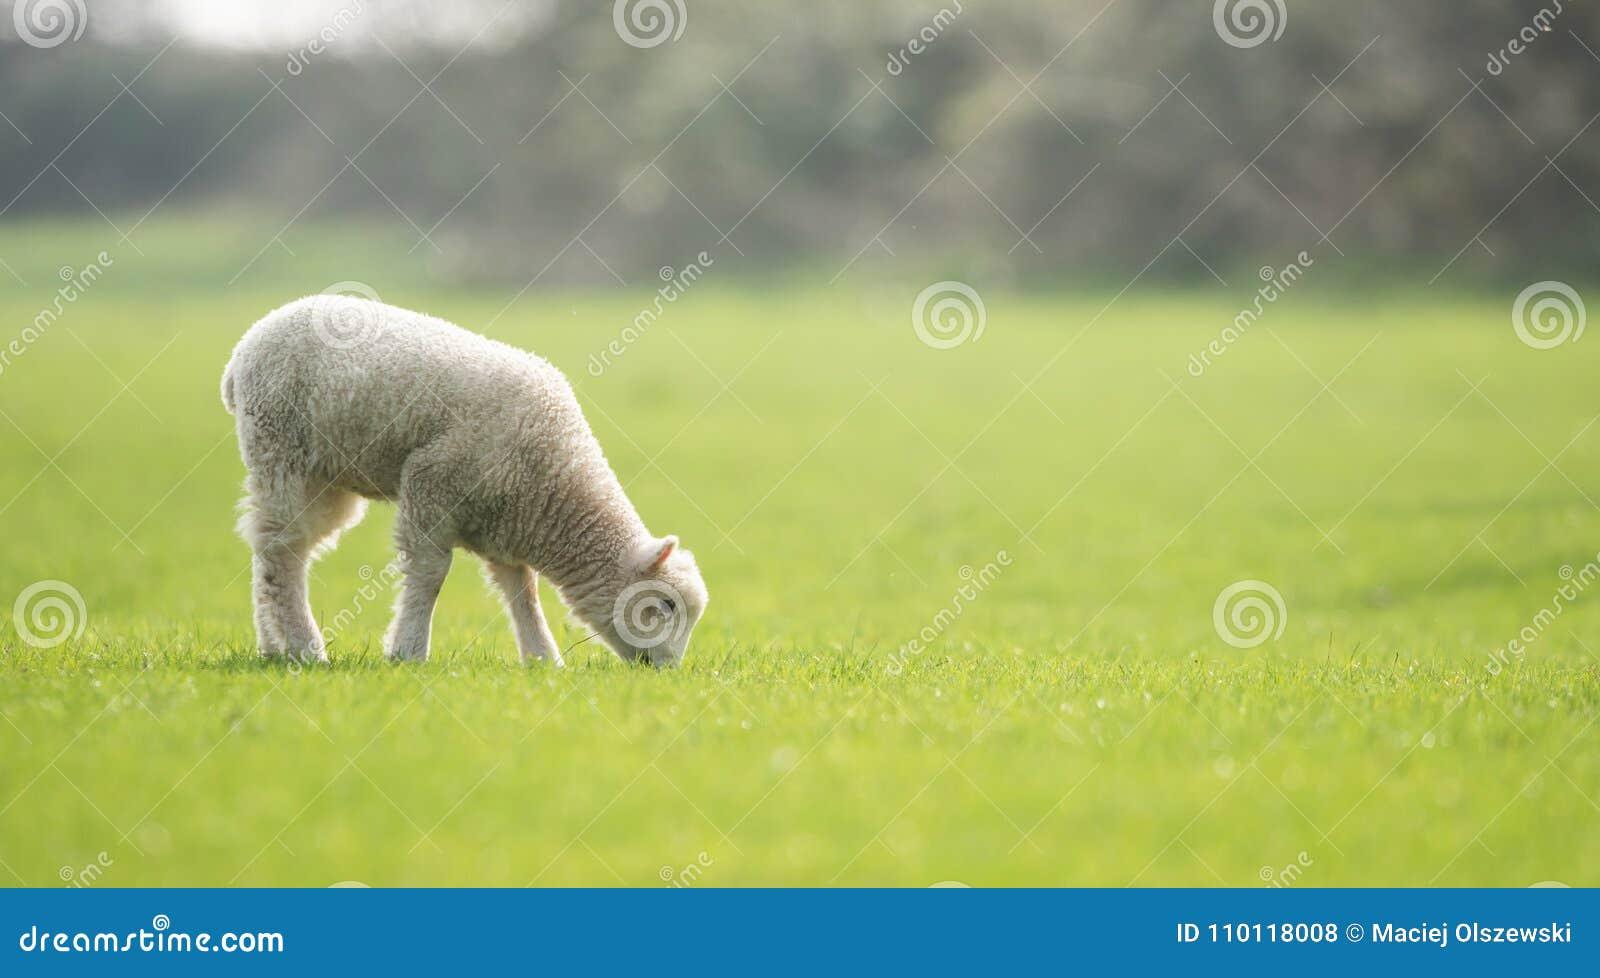 Sheep, Lamb, Ram, Ovis aries